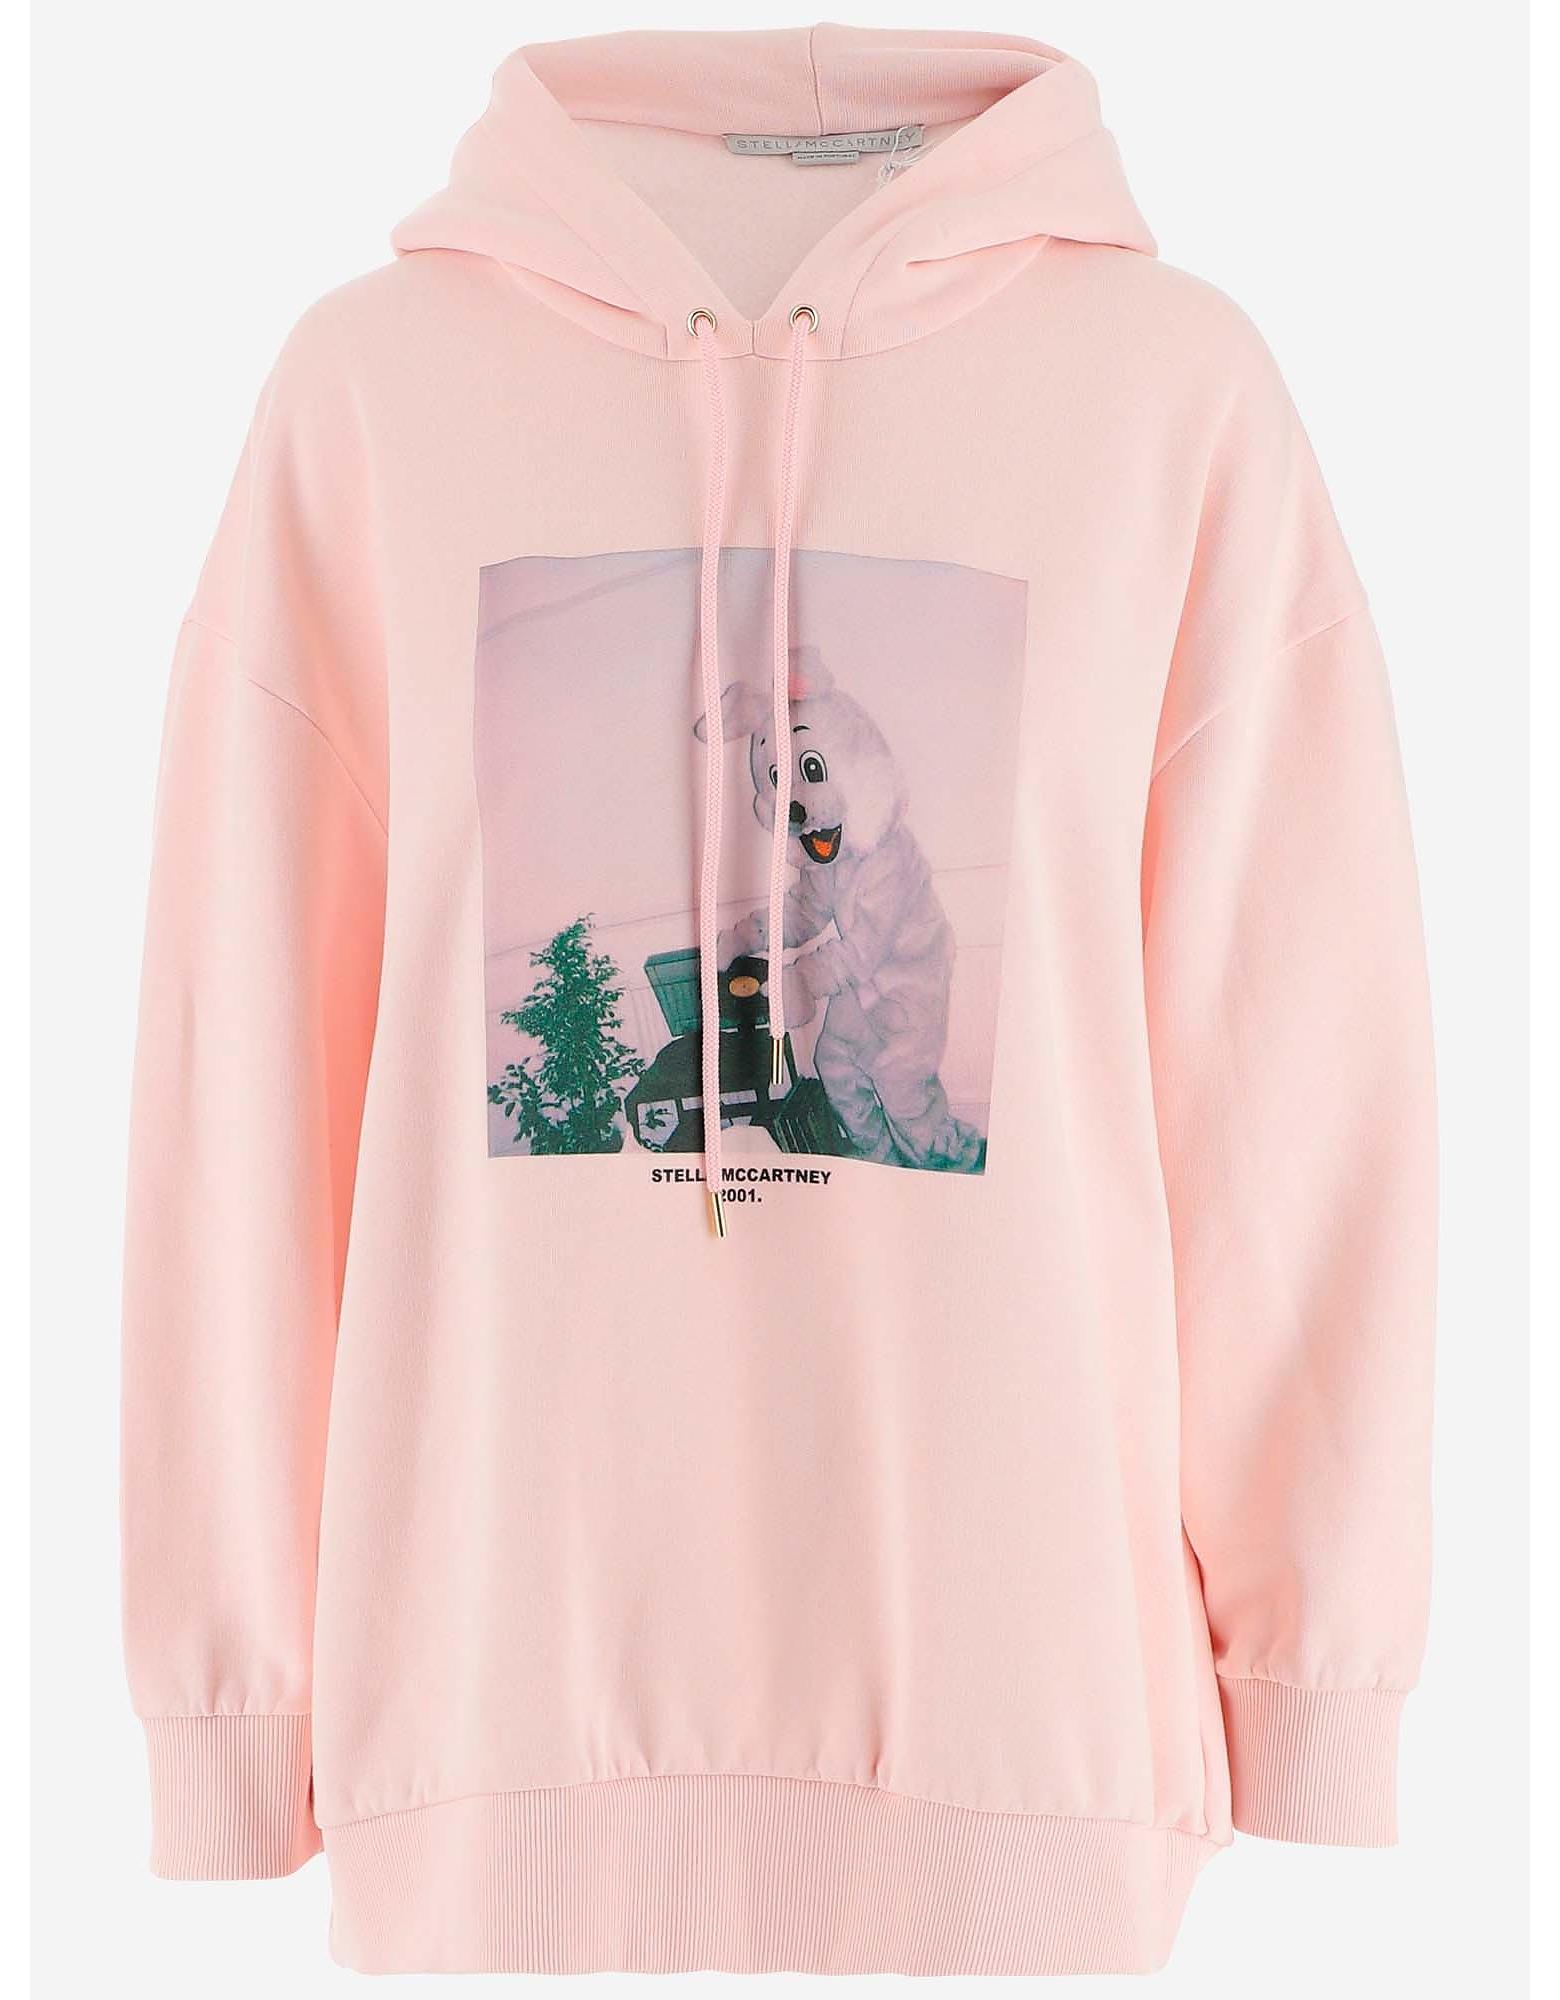 Stella McCartney Designer Sweatshirts, Women's Sweatshirt